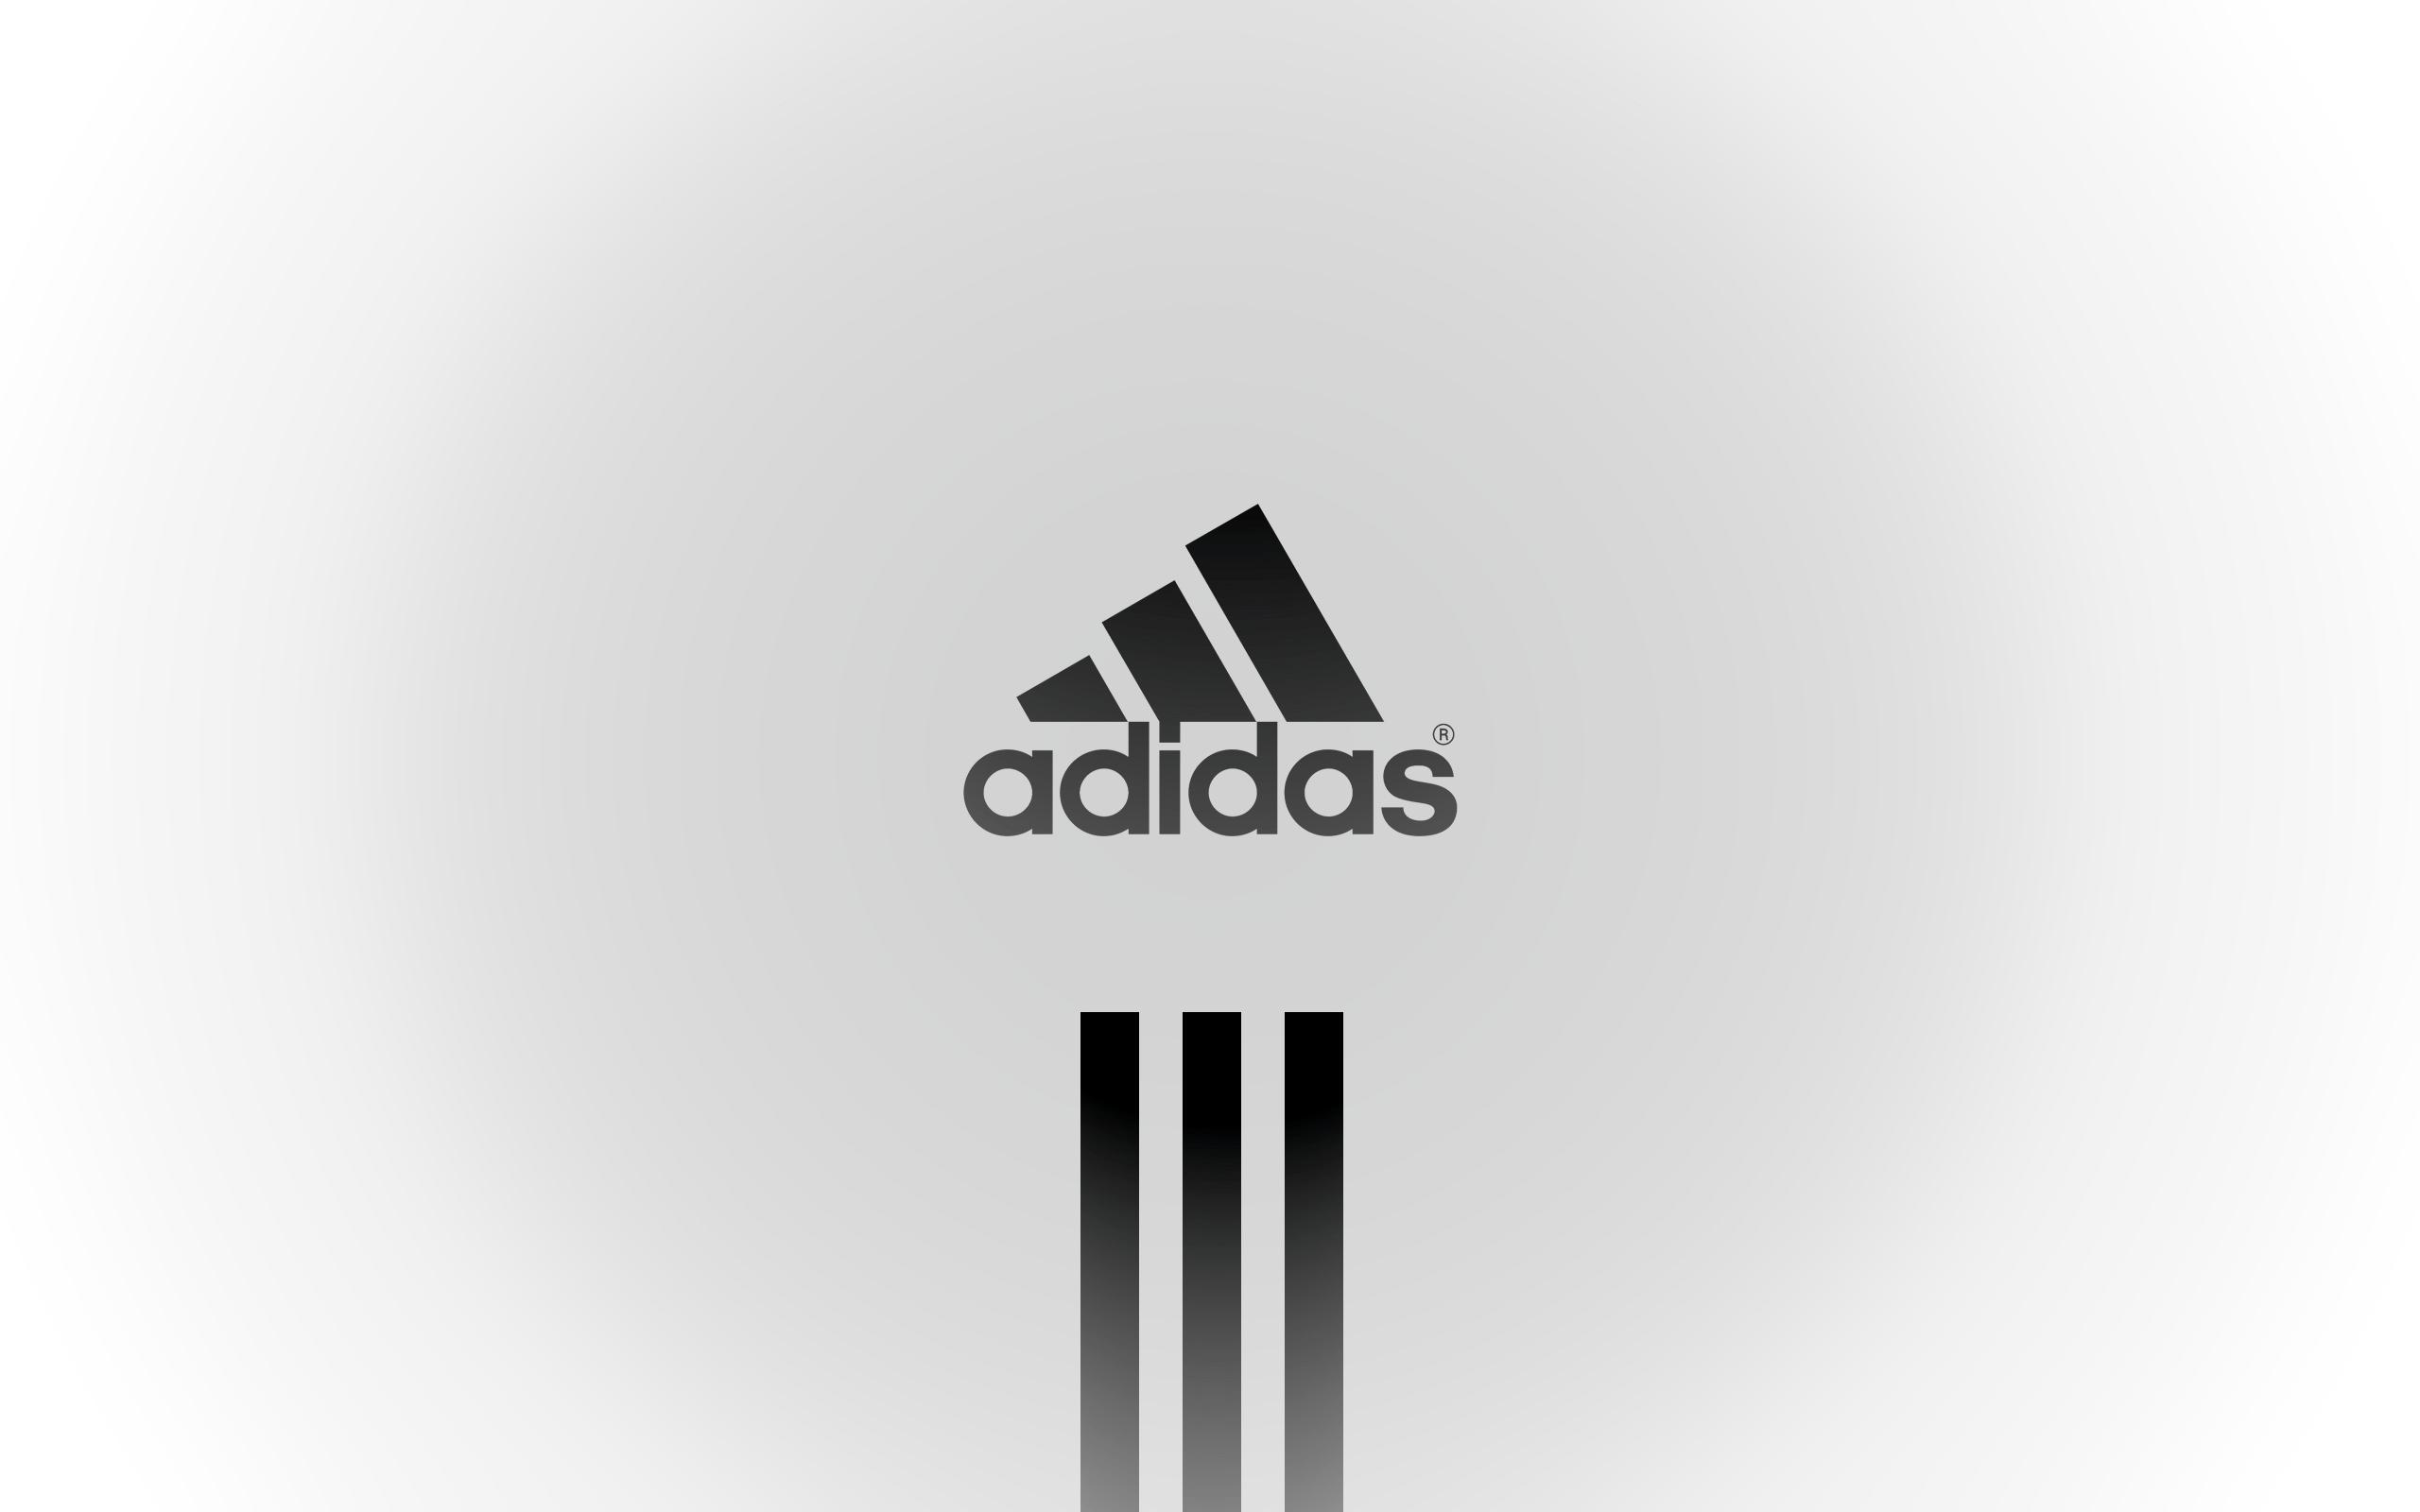 Adidas Logo White Png - Adidas HD PNG